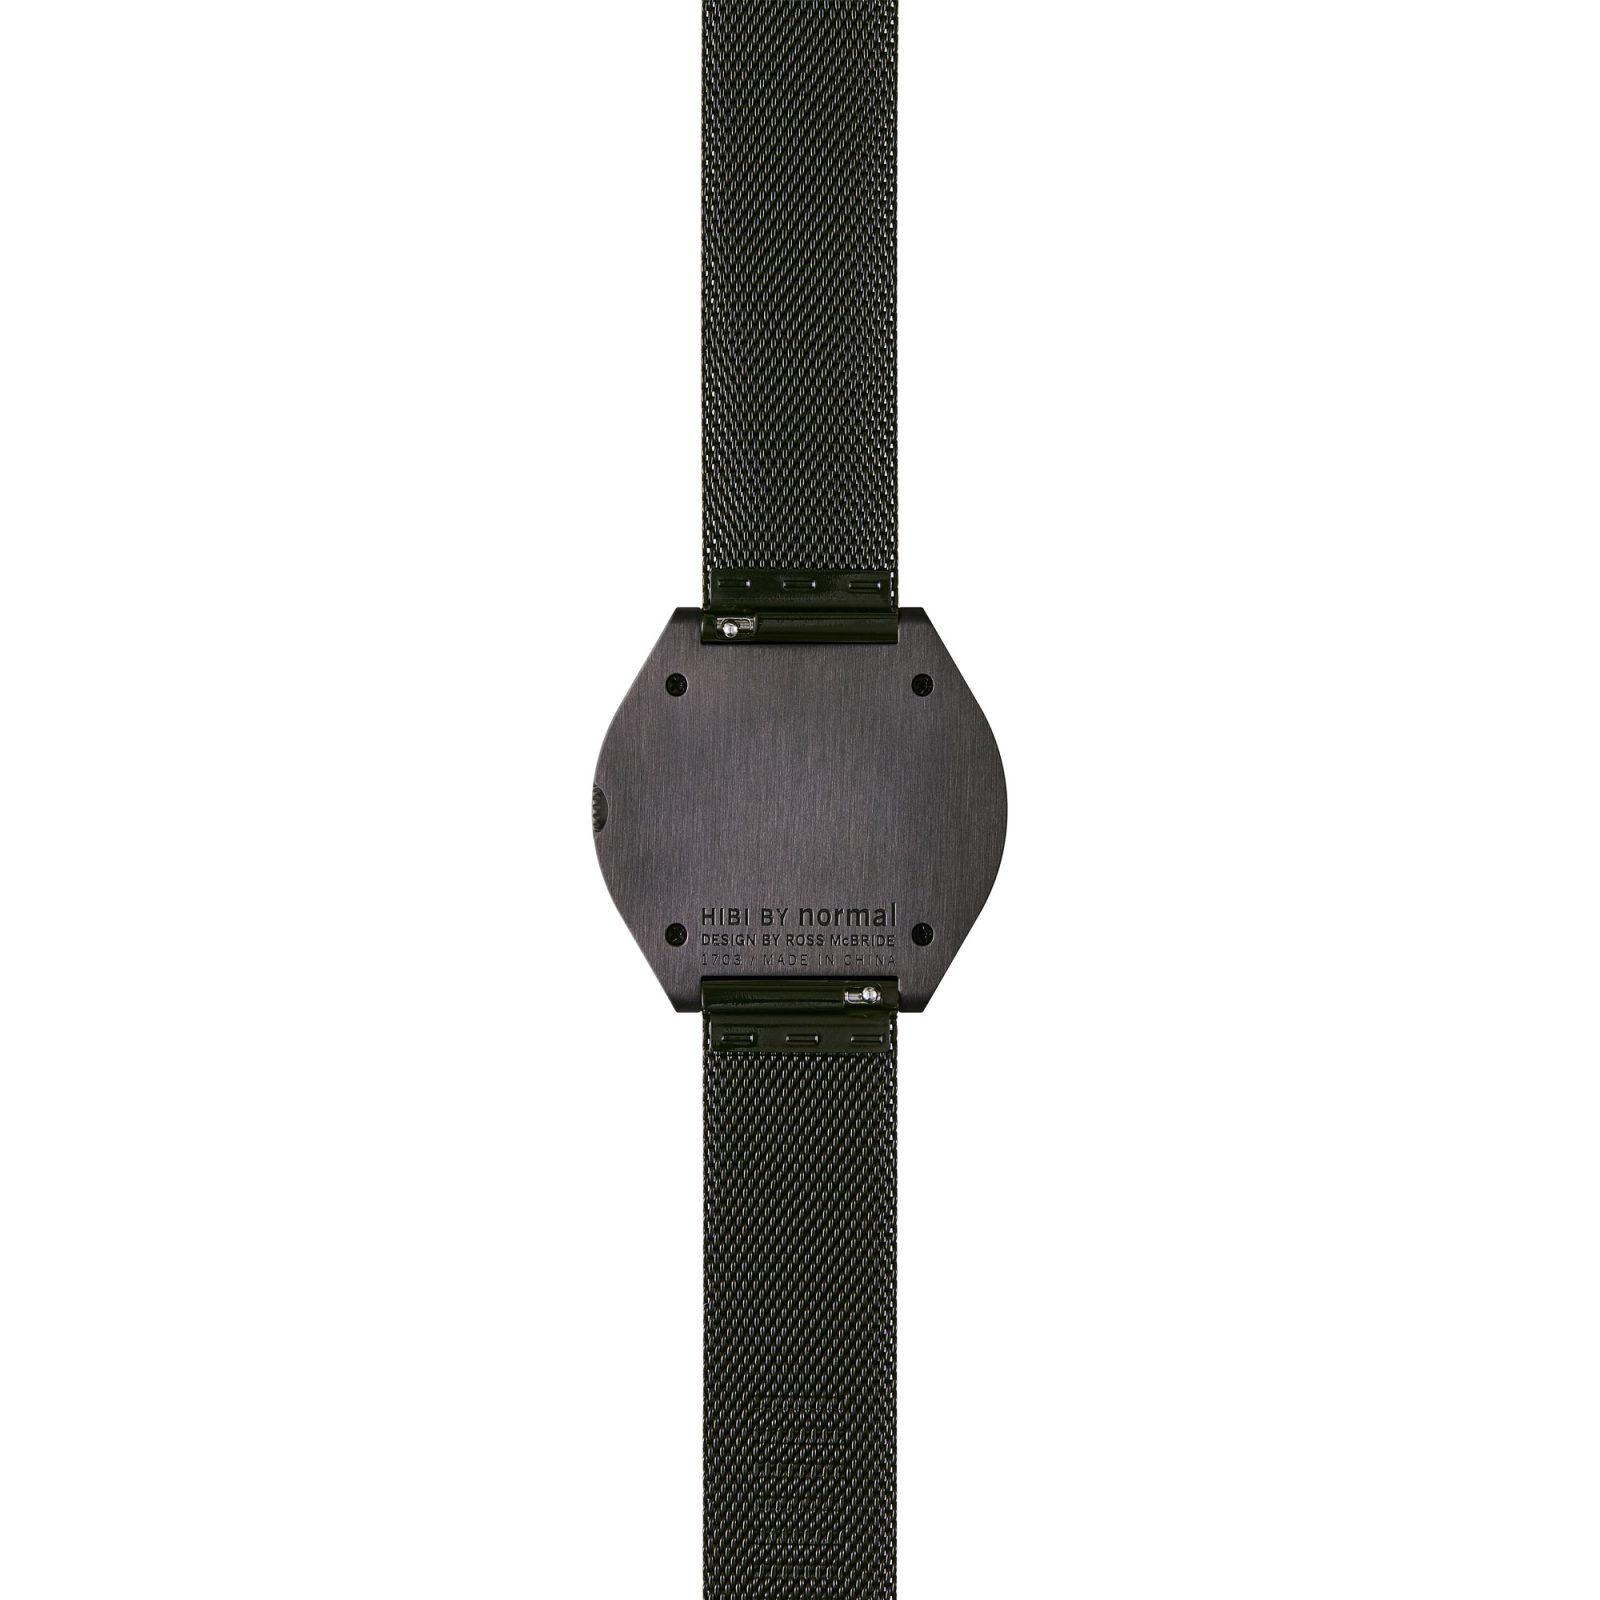 hibi-h24-black-steel-mesh-5